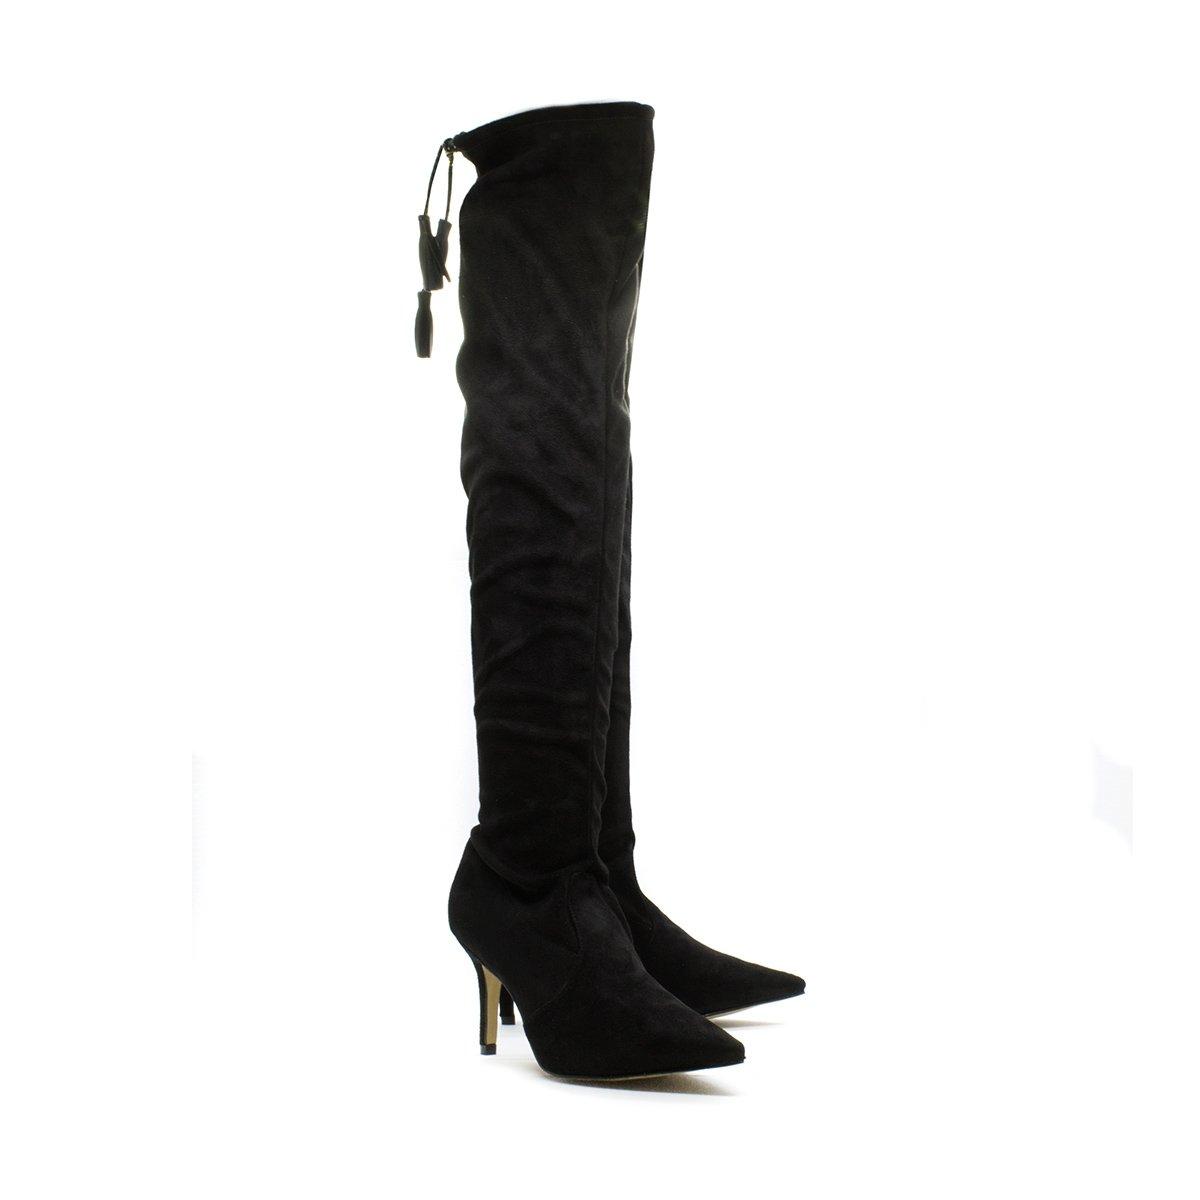 Inbox Bota Camurça Preto The Shoes Bota Over Feminina Over Knee cY0qdB1w